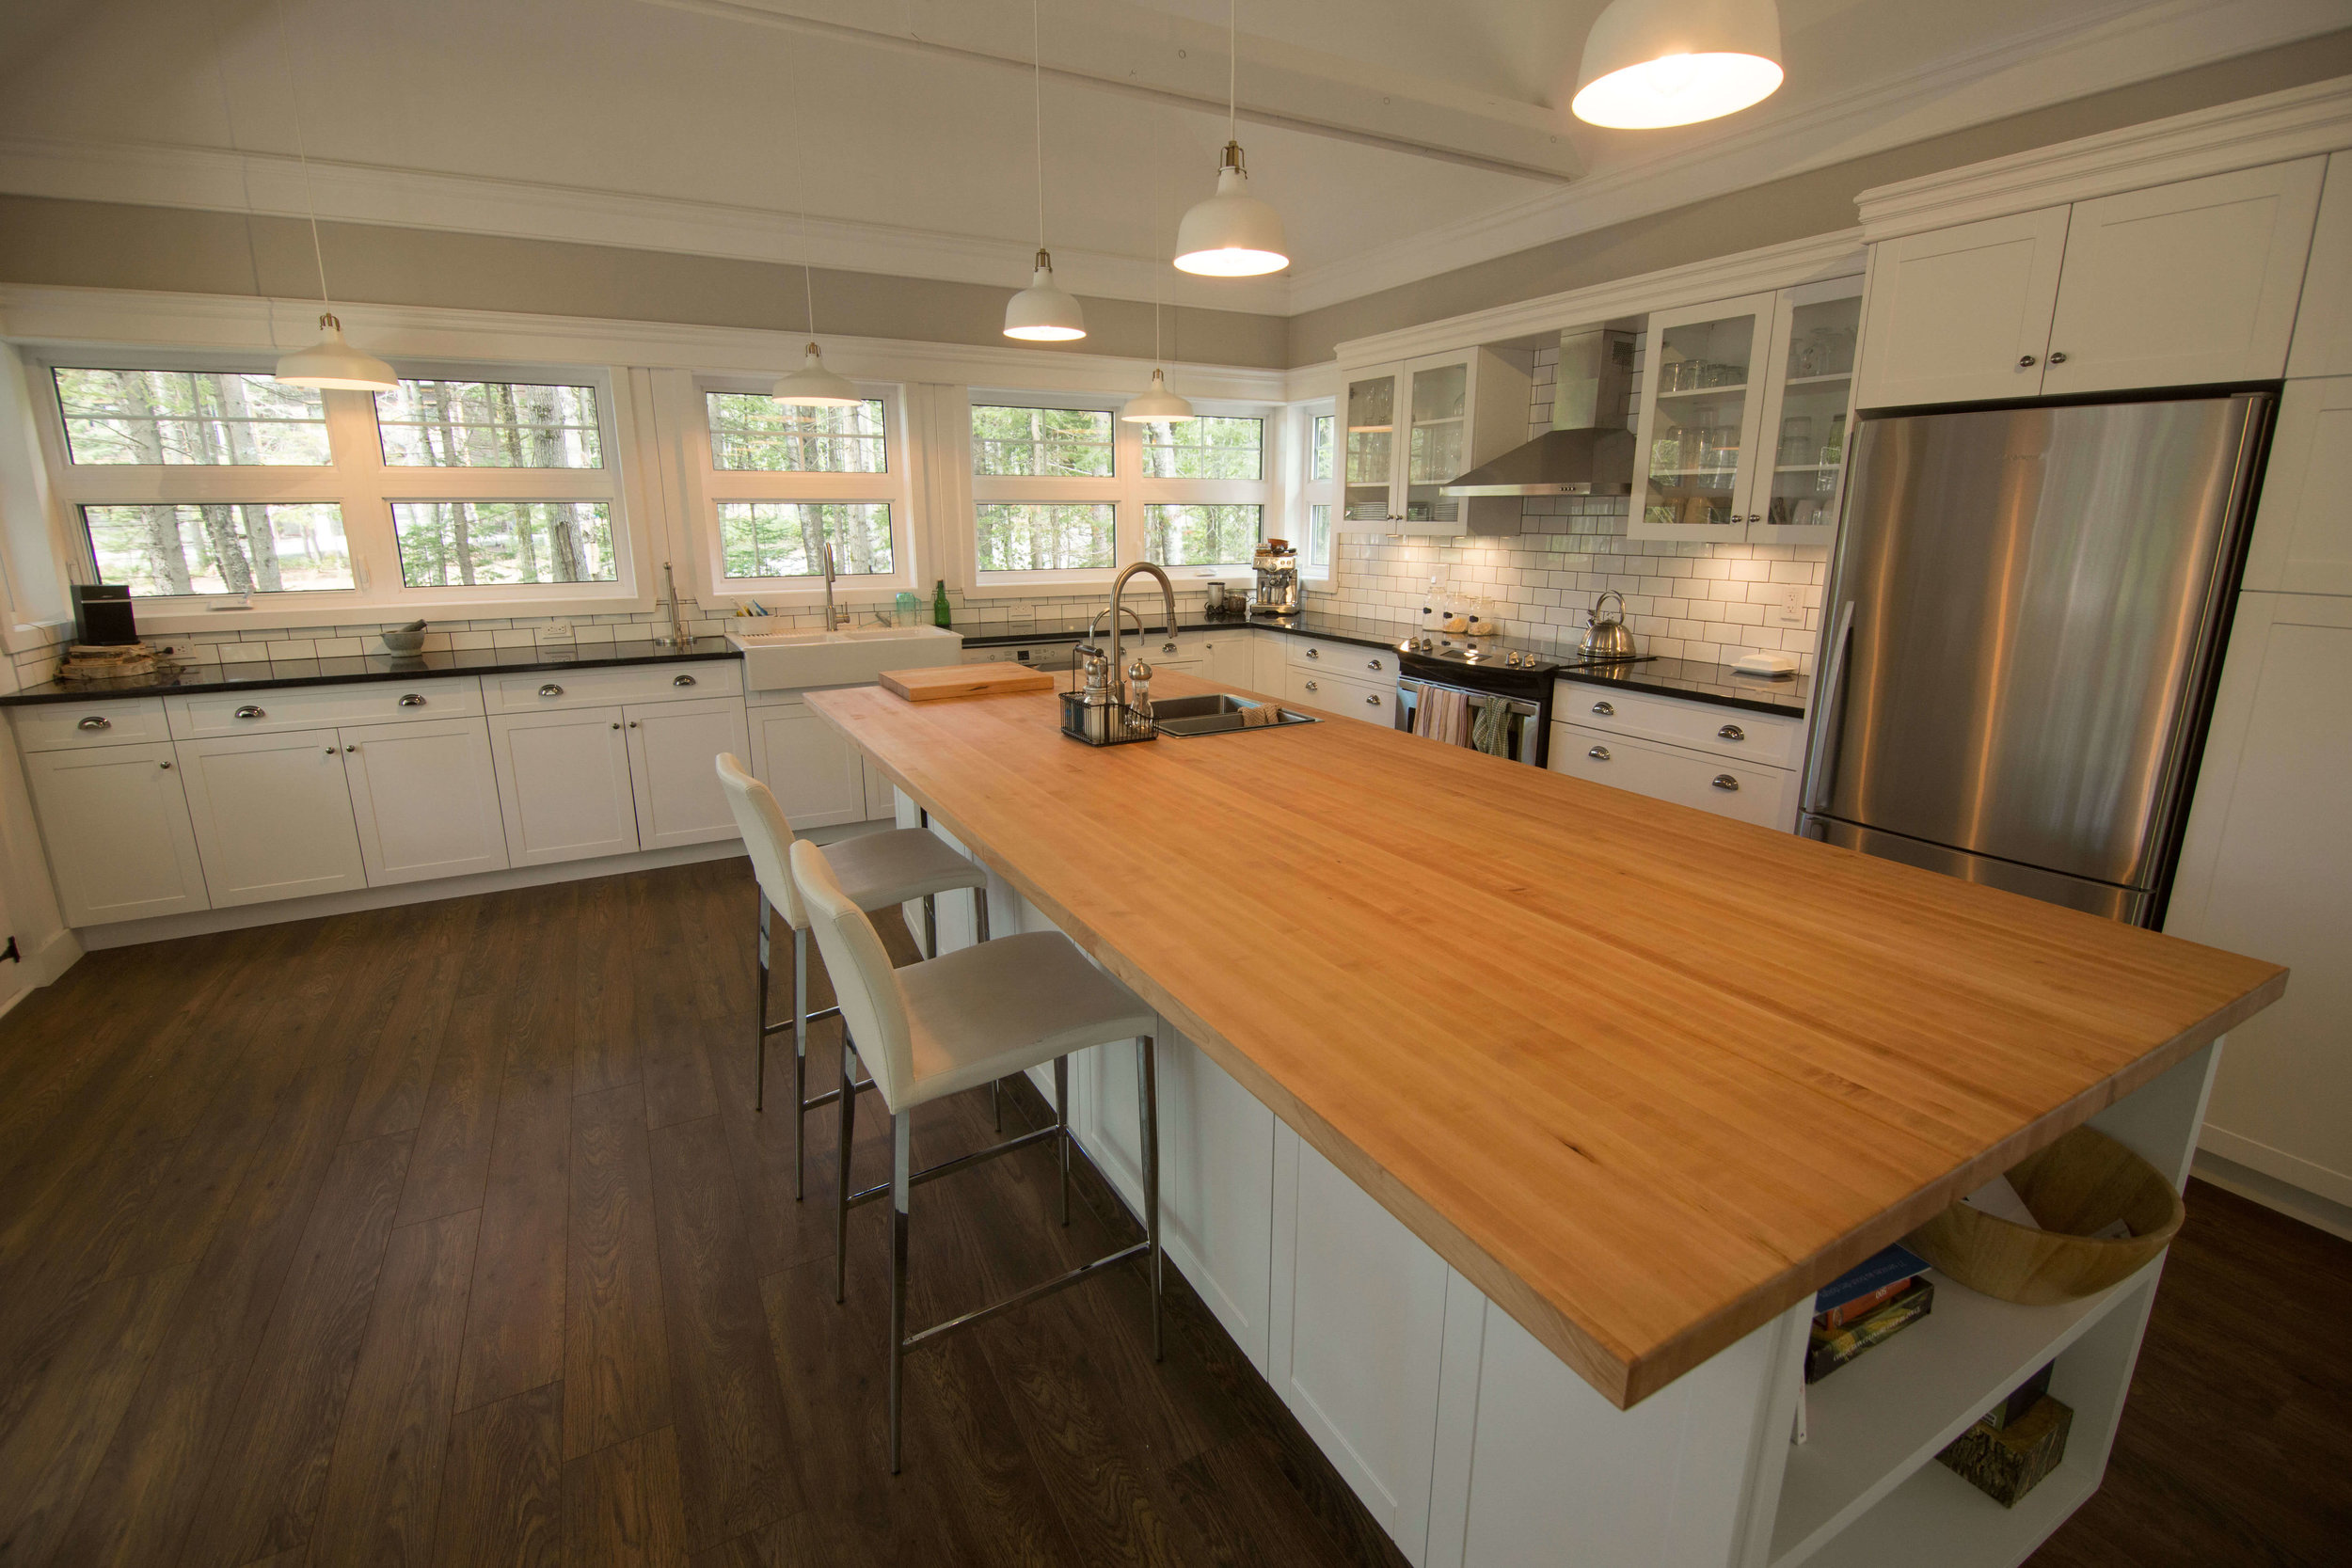 cuisine-nobilis-2016-renovation-leblanc